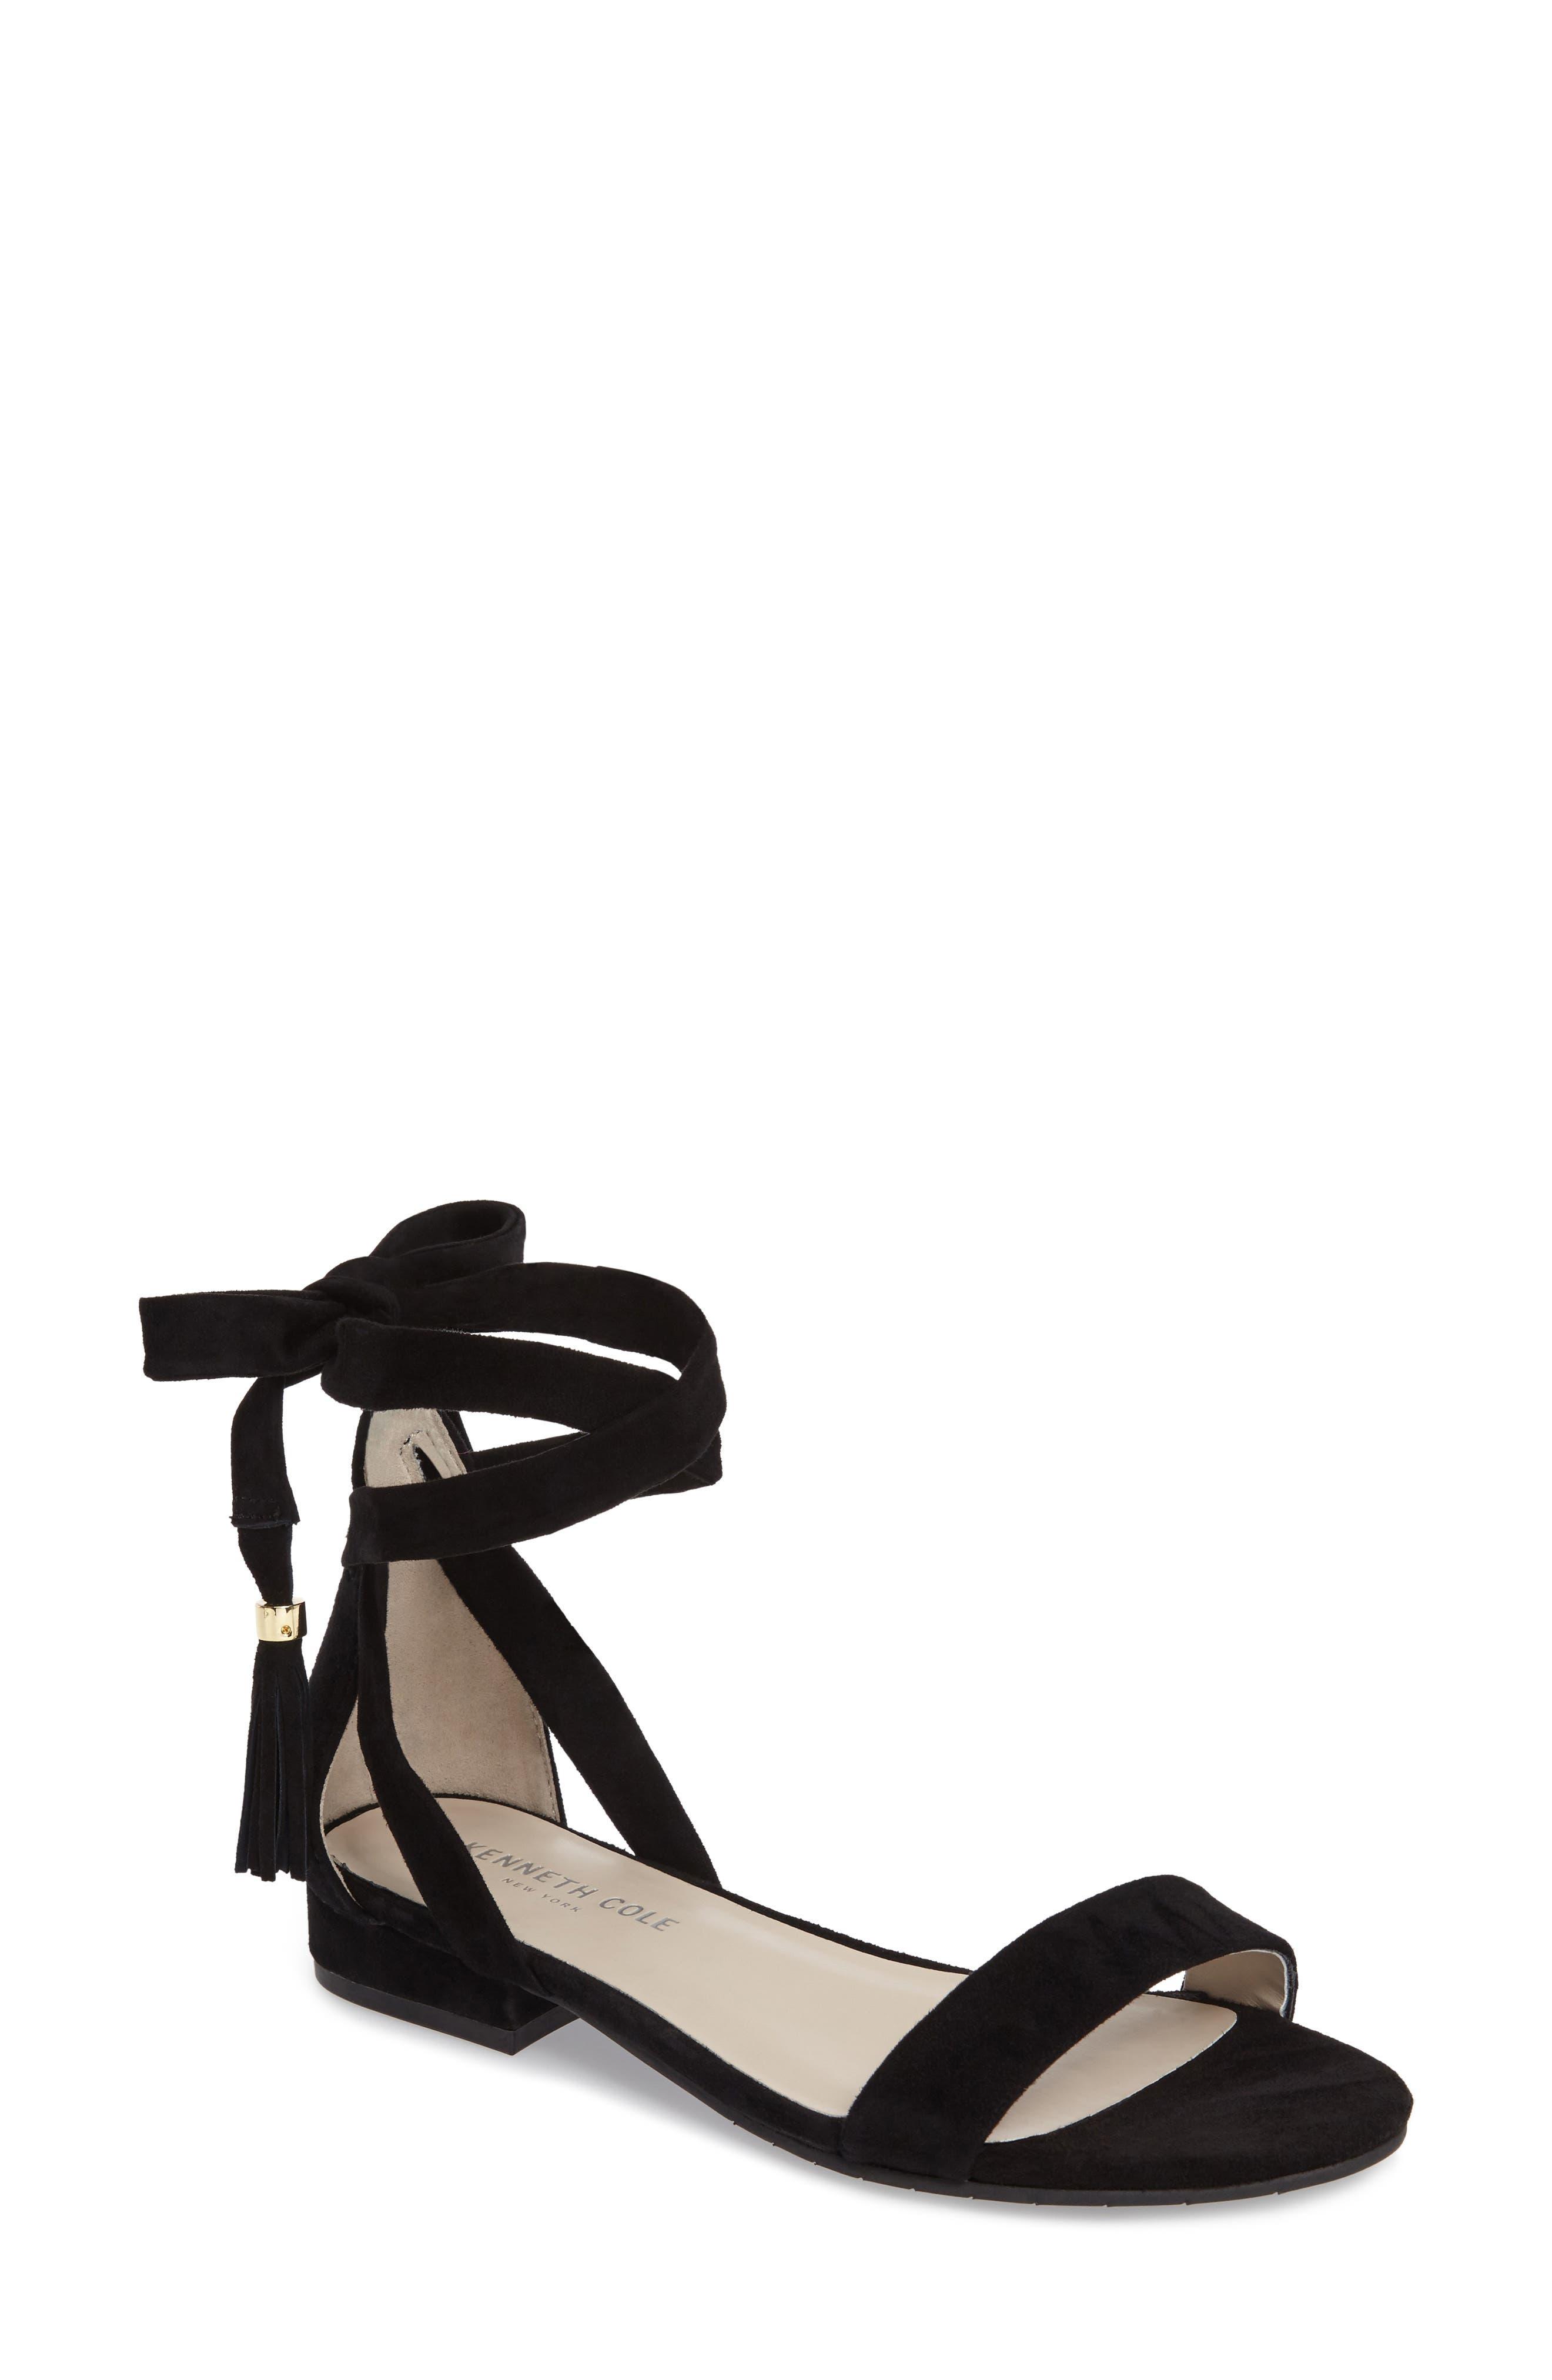 Valen Tassel Lace-Up Sandal,                         Main,                         color, Black Suede